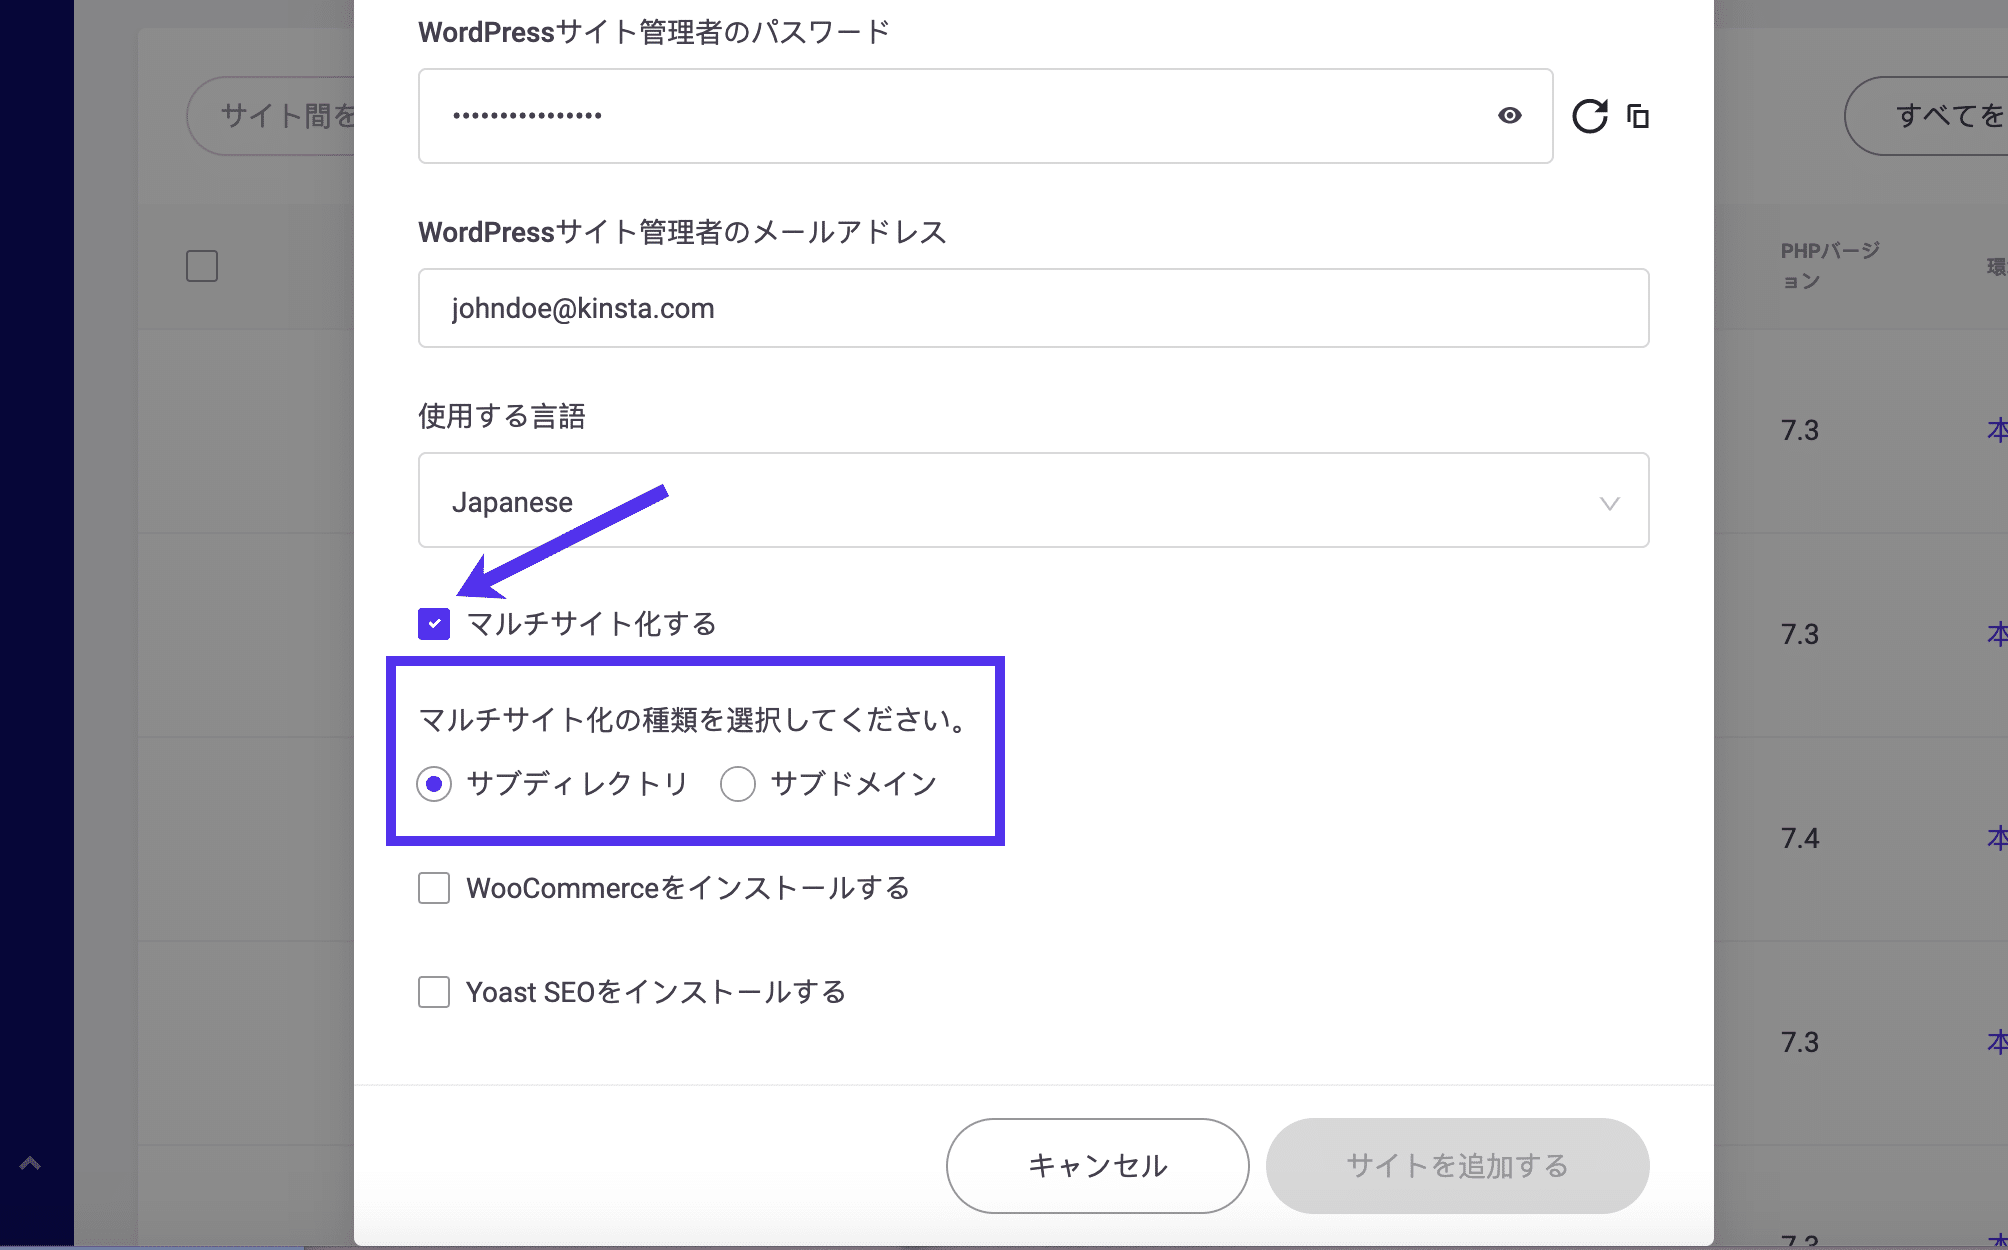 MyKinstaでのWordPressインストール時にマルチサイトを有効にする